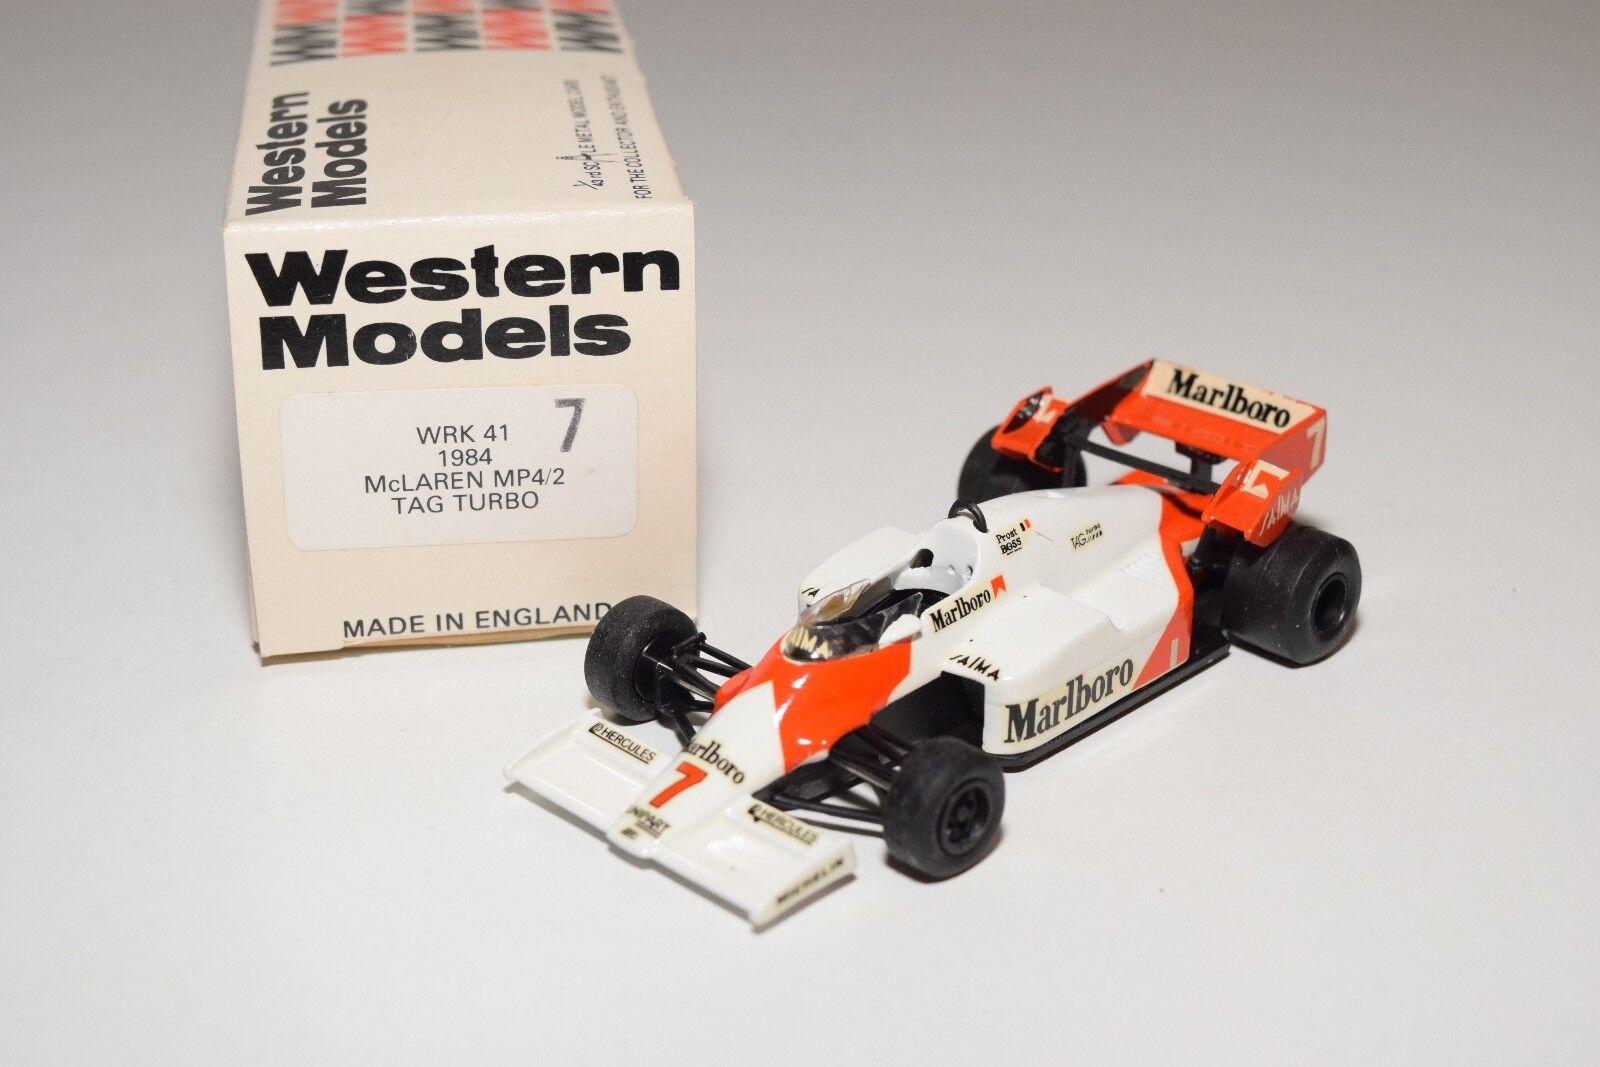 I WESTERN MODELS WM WRK41 1984 MCLAREN MP4 2 TAG TURBO 7 RACING CAR MINT BOXED